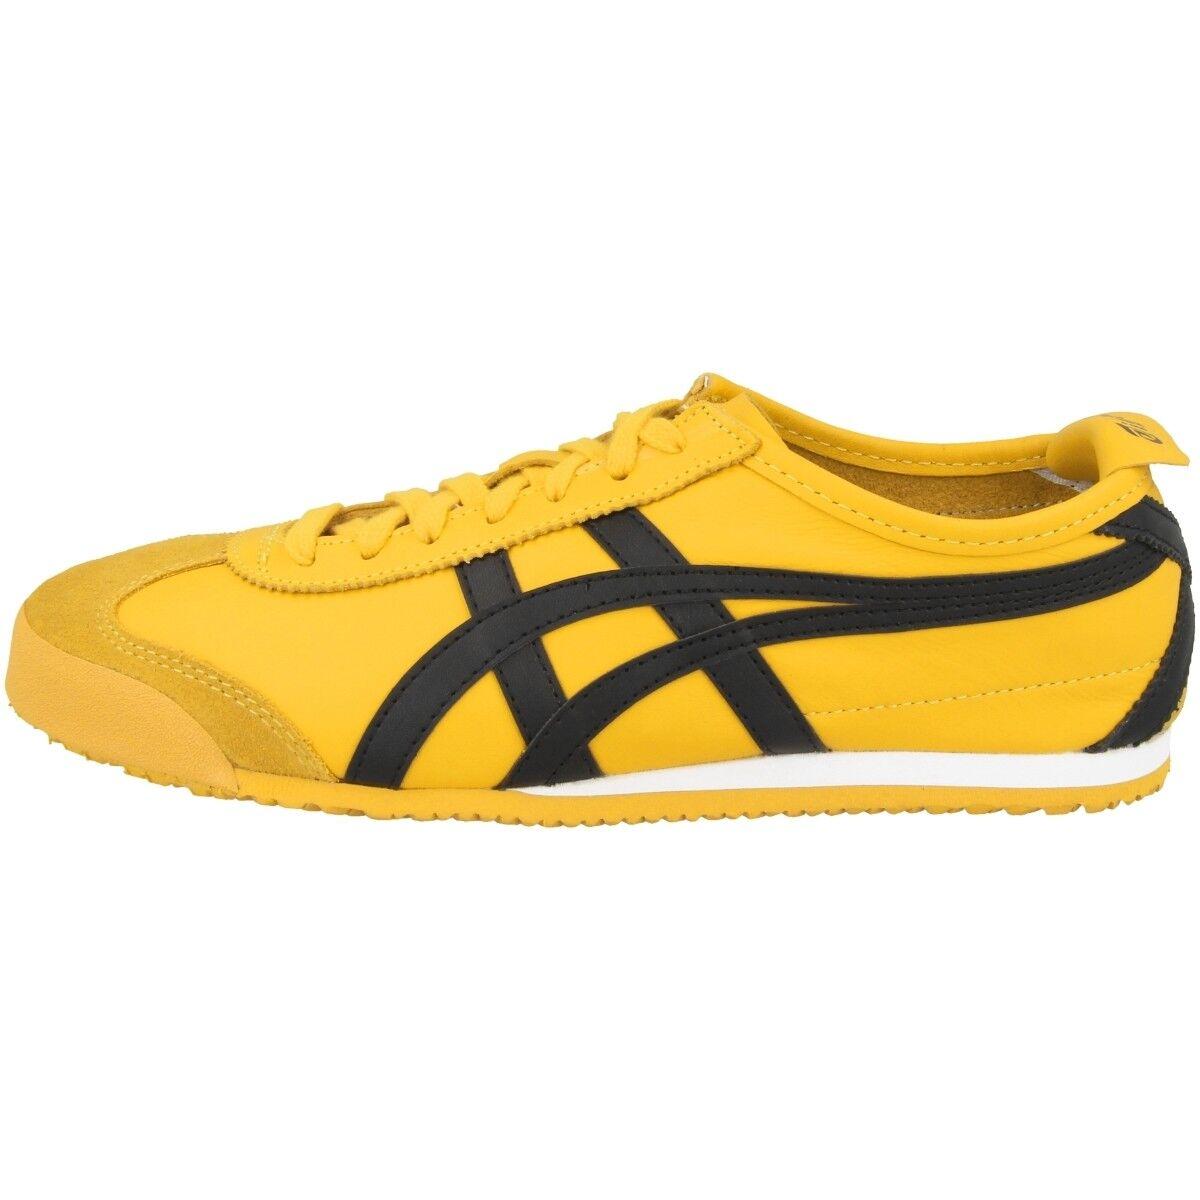 Asics Onitsuka Tiger dl408-0490 méxico 66 zapatos Yellow Black dl408-0490 Tiger retro cortos 261ee2